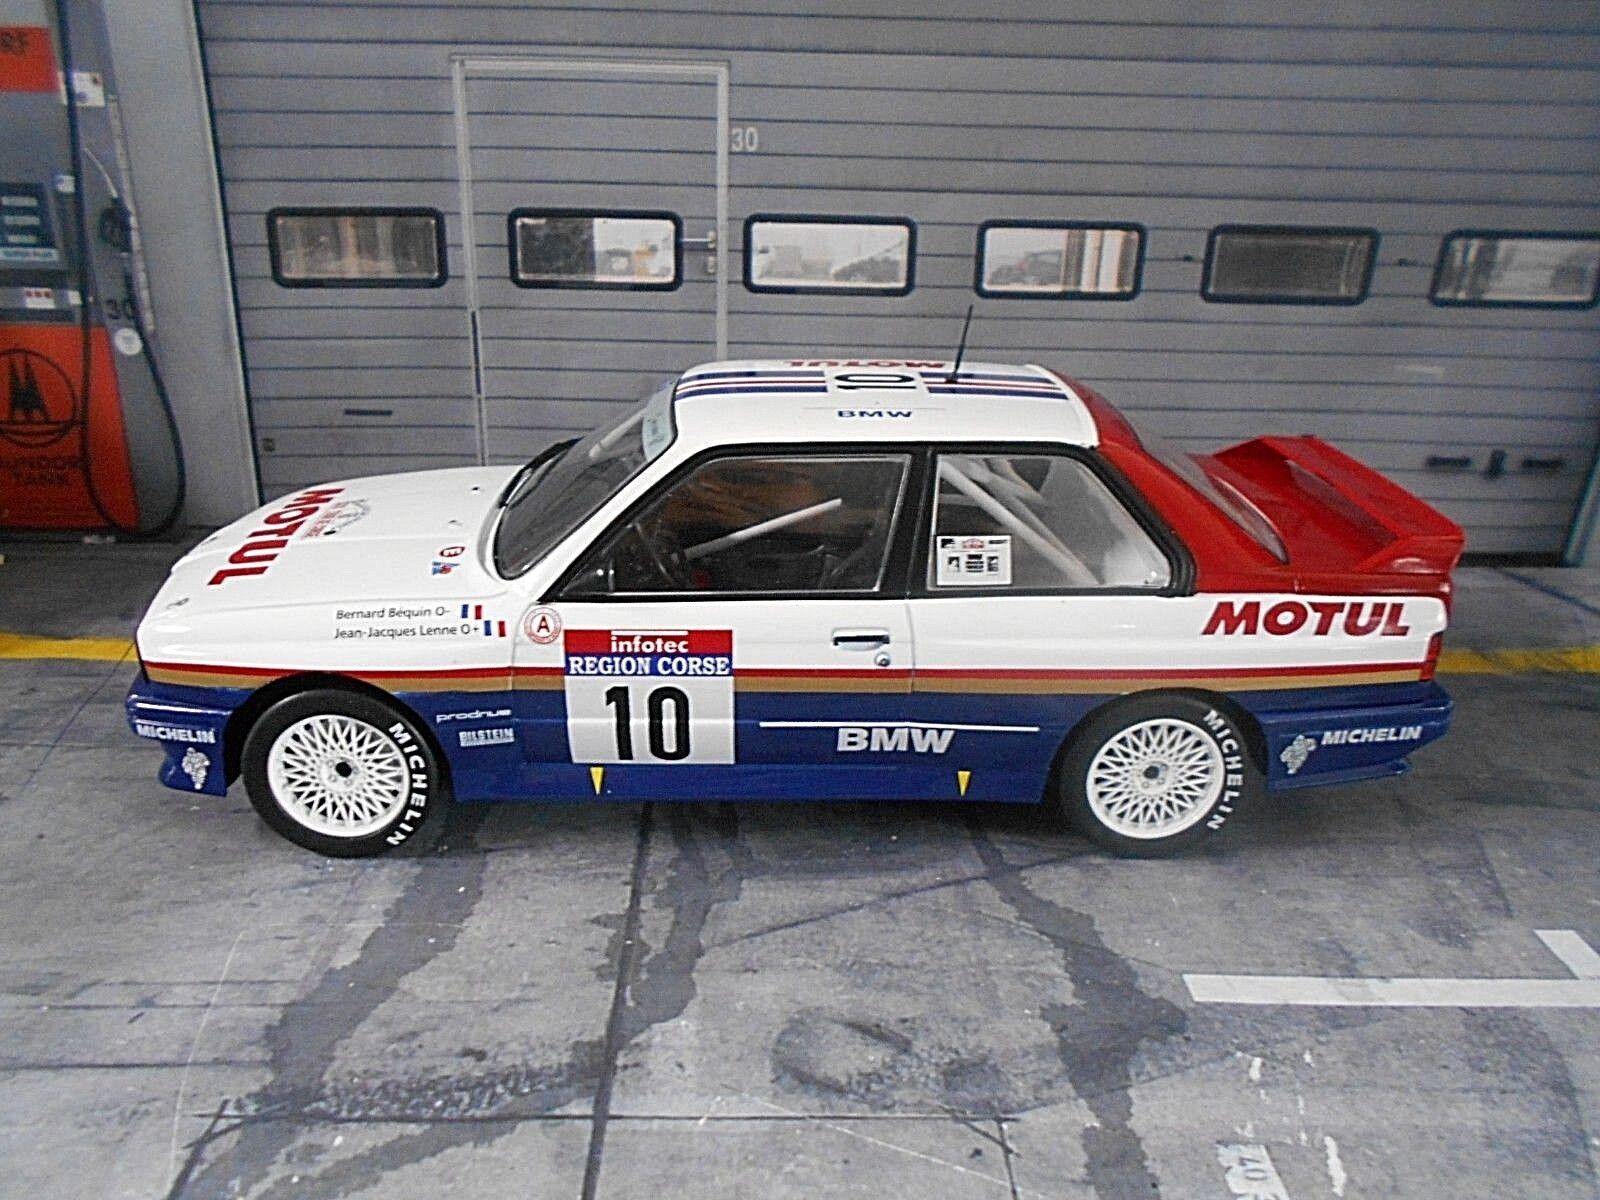 Bmw m3 e30. ein rallye - tour de corse gewinner béguin 1987   10 ixo altaya 1,18